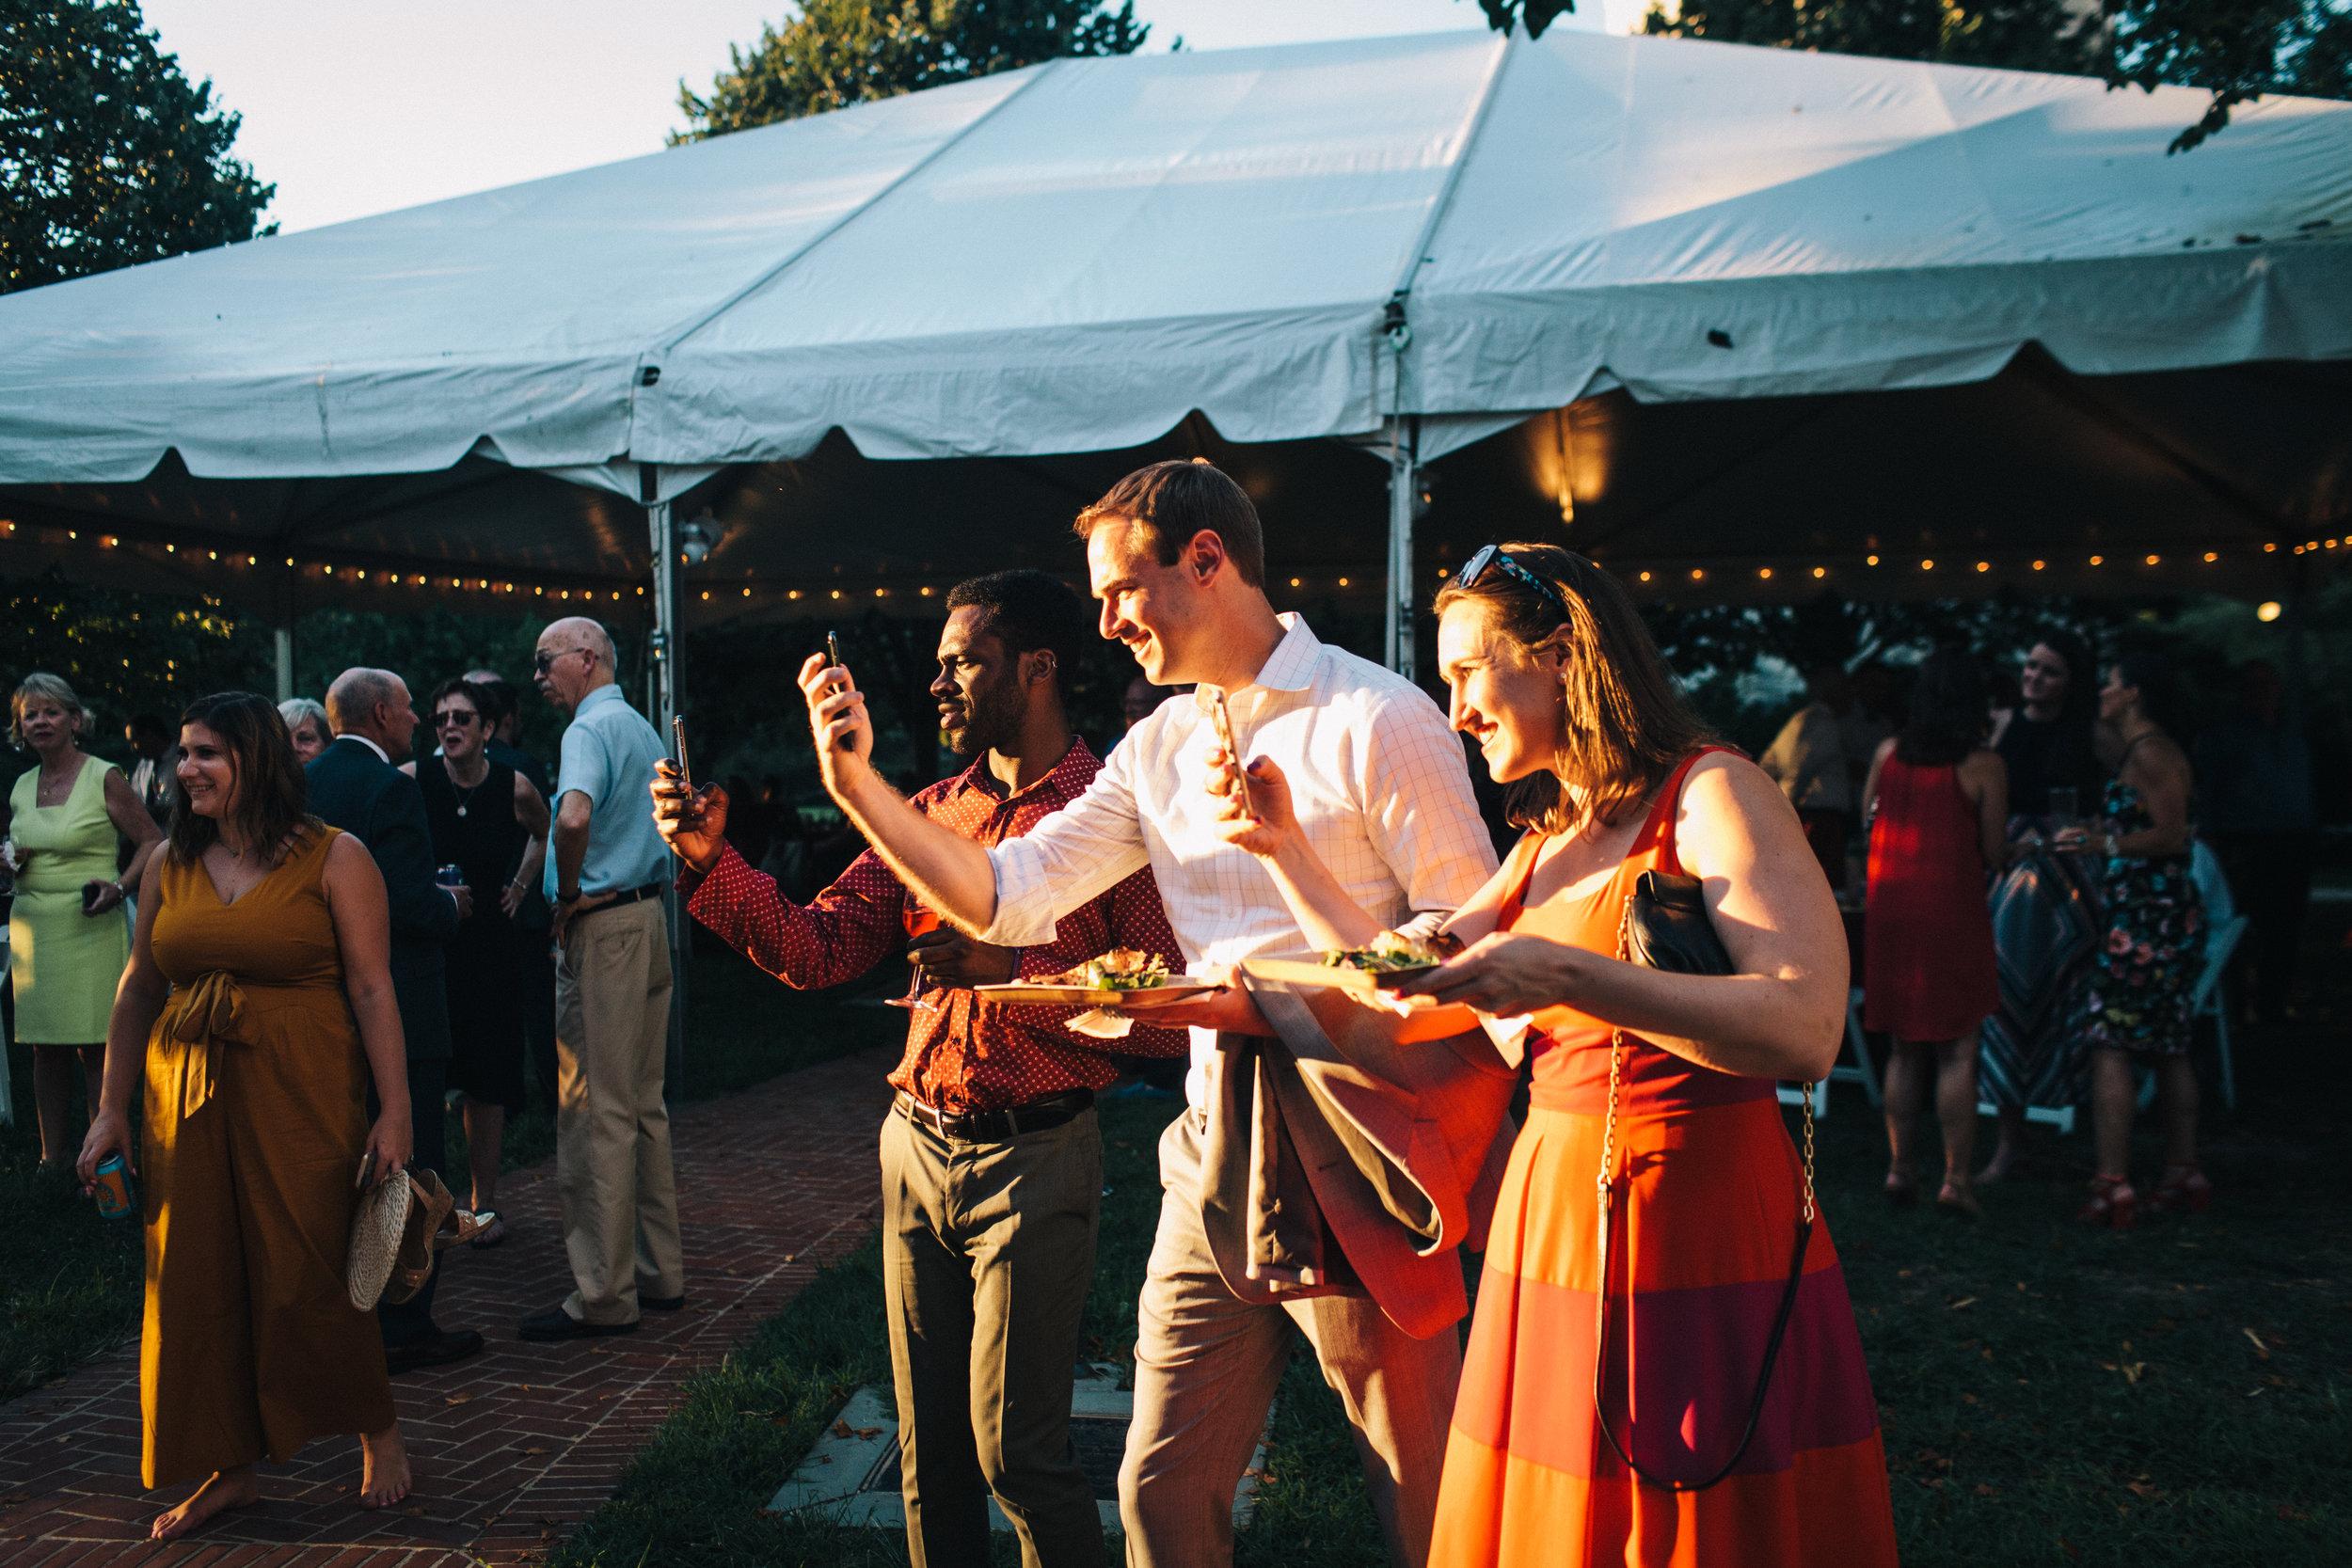 Harlan_LeeHart_Wedding-122.jpg